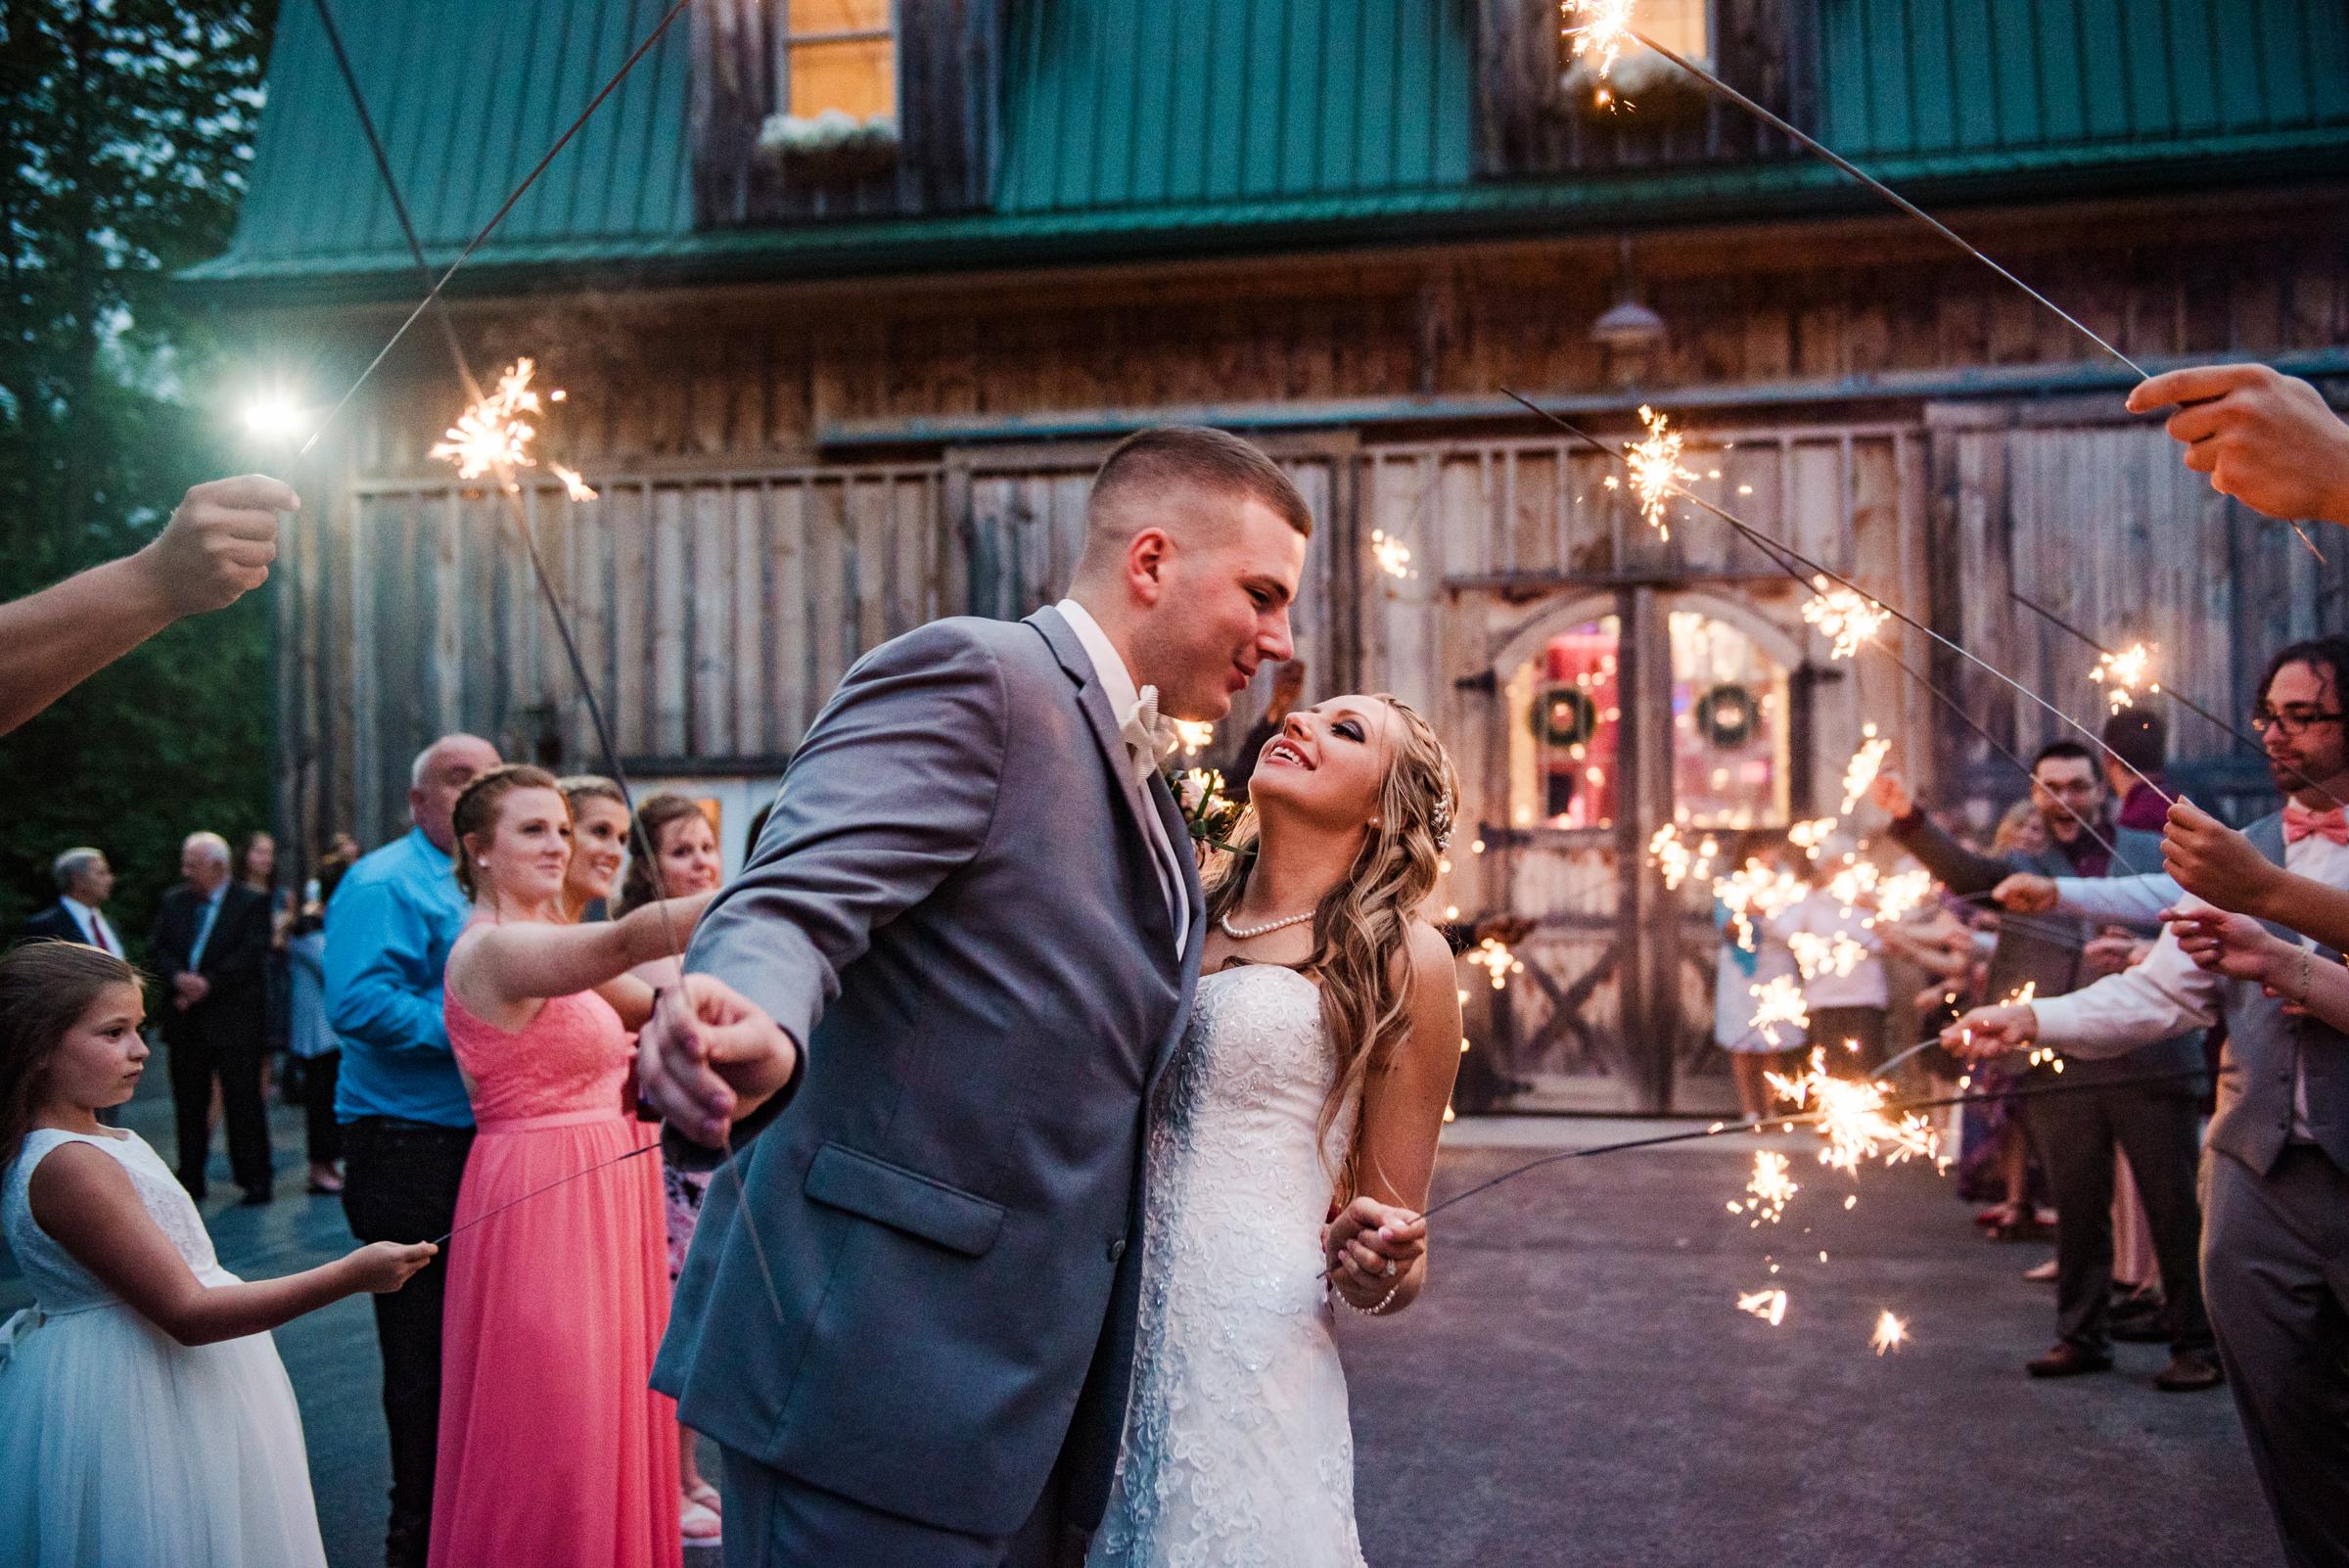 Wolf_Oak_Acres_Central_NY_Wedding_JILL_STUDIO_Rochester_NY_Photographer_DSC_9119.jpg